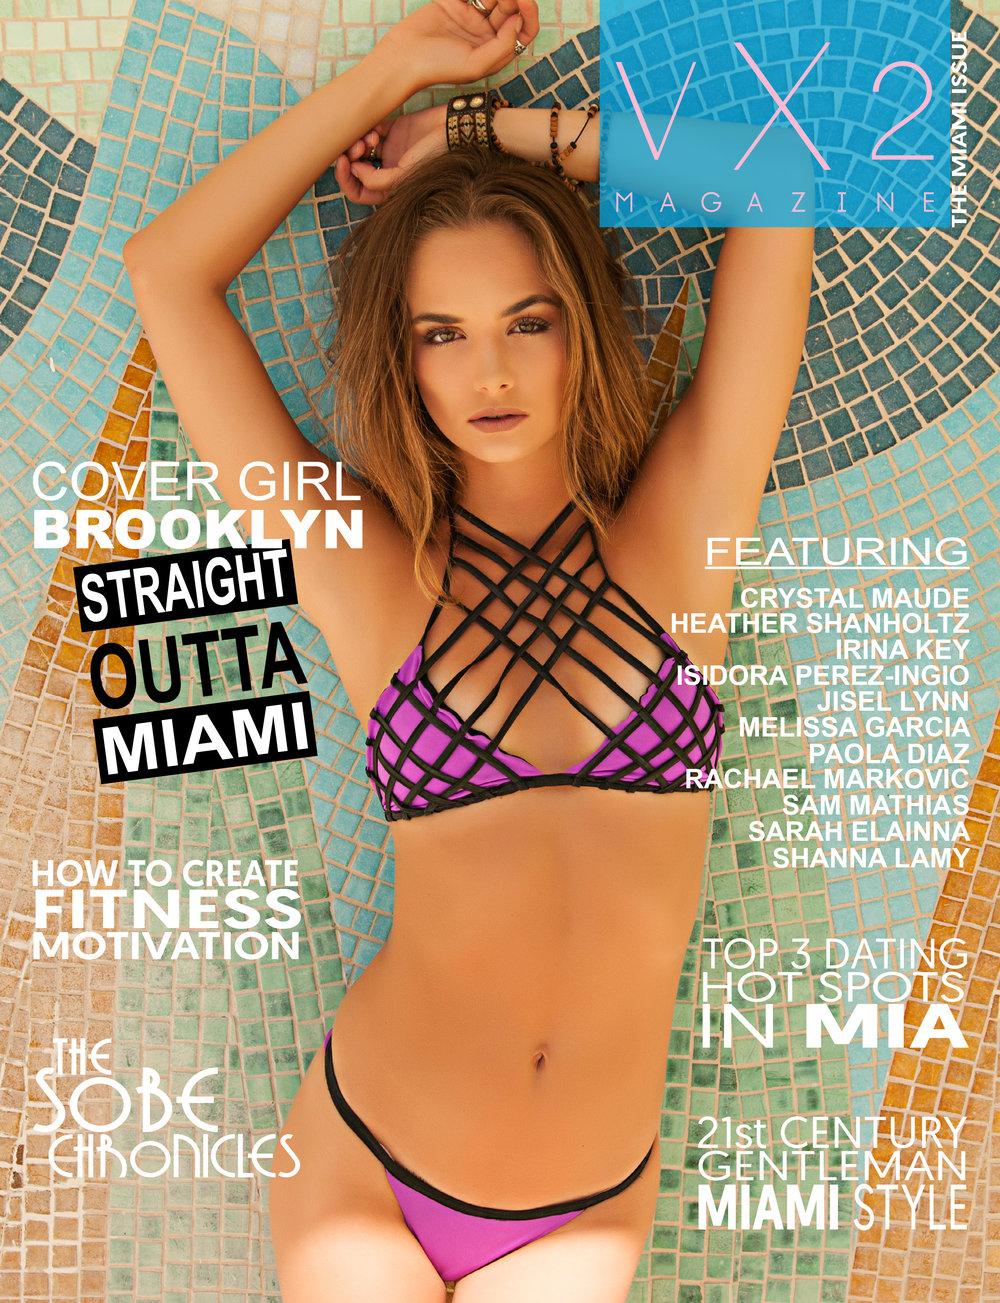 Miami Cover VX2 Magazine.jpg